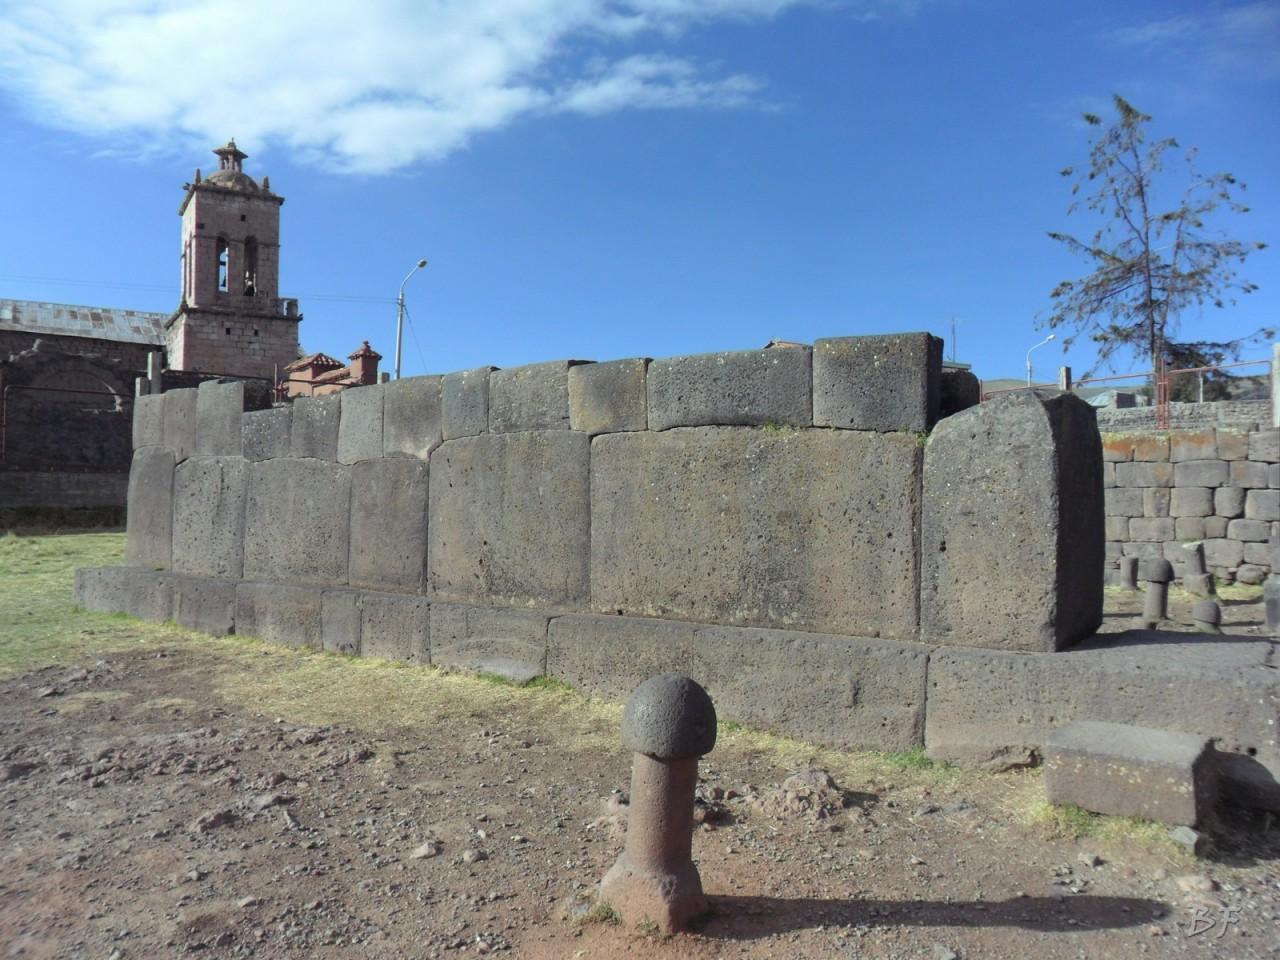 Mura-Poligonali-Megaliti-Inca-Uyo-Puno-Perù-6